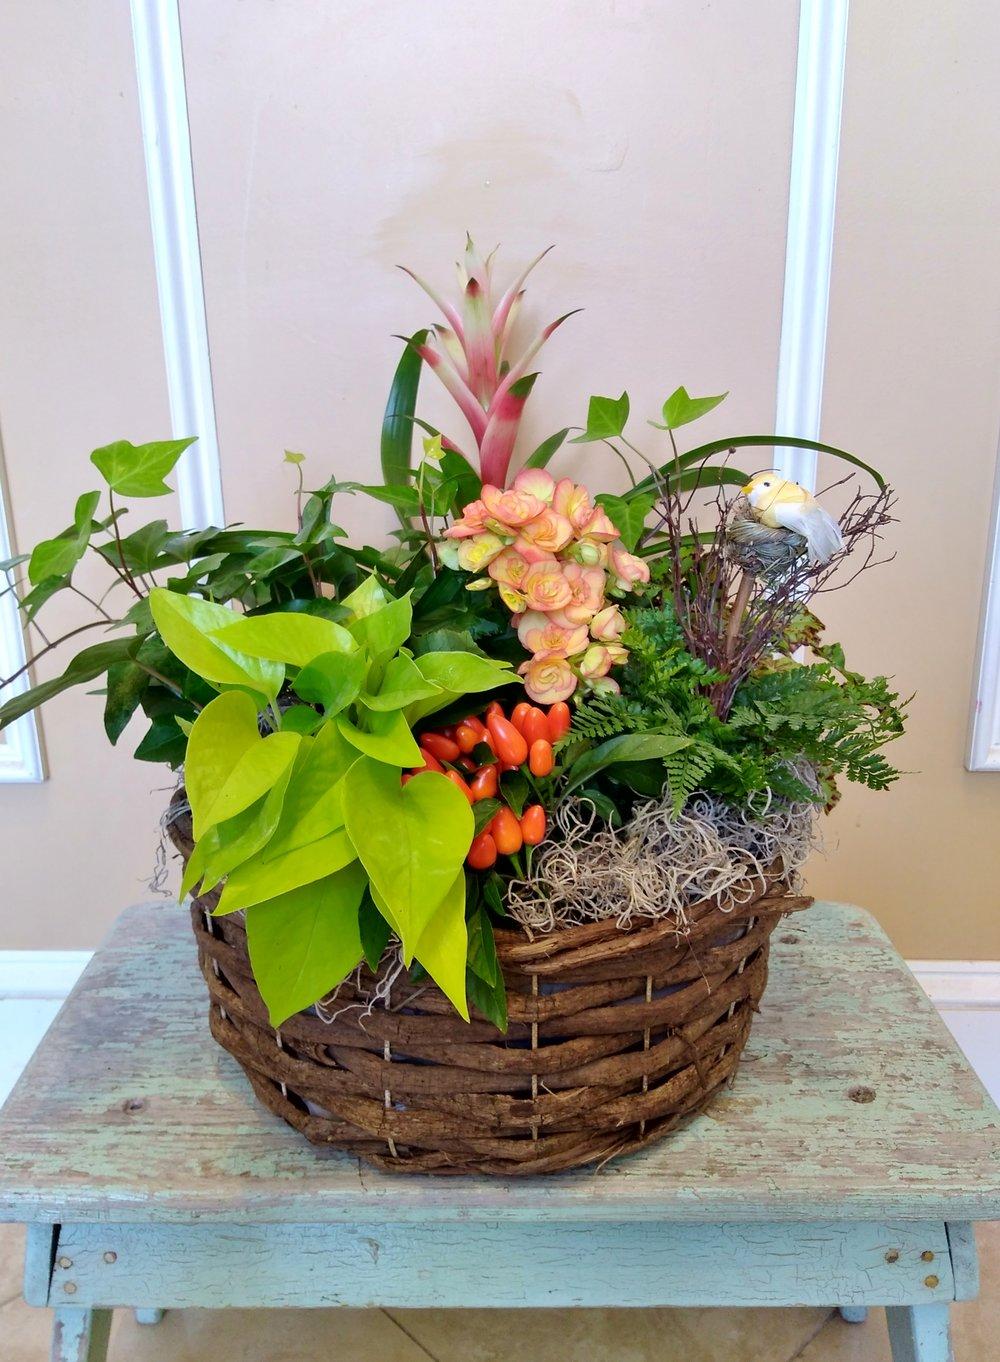 C2   $60 - $125 European plant basket. $60 as shown.